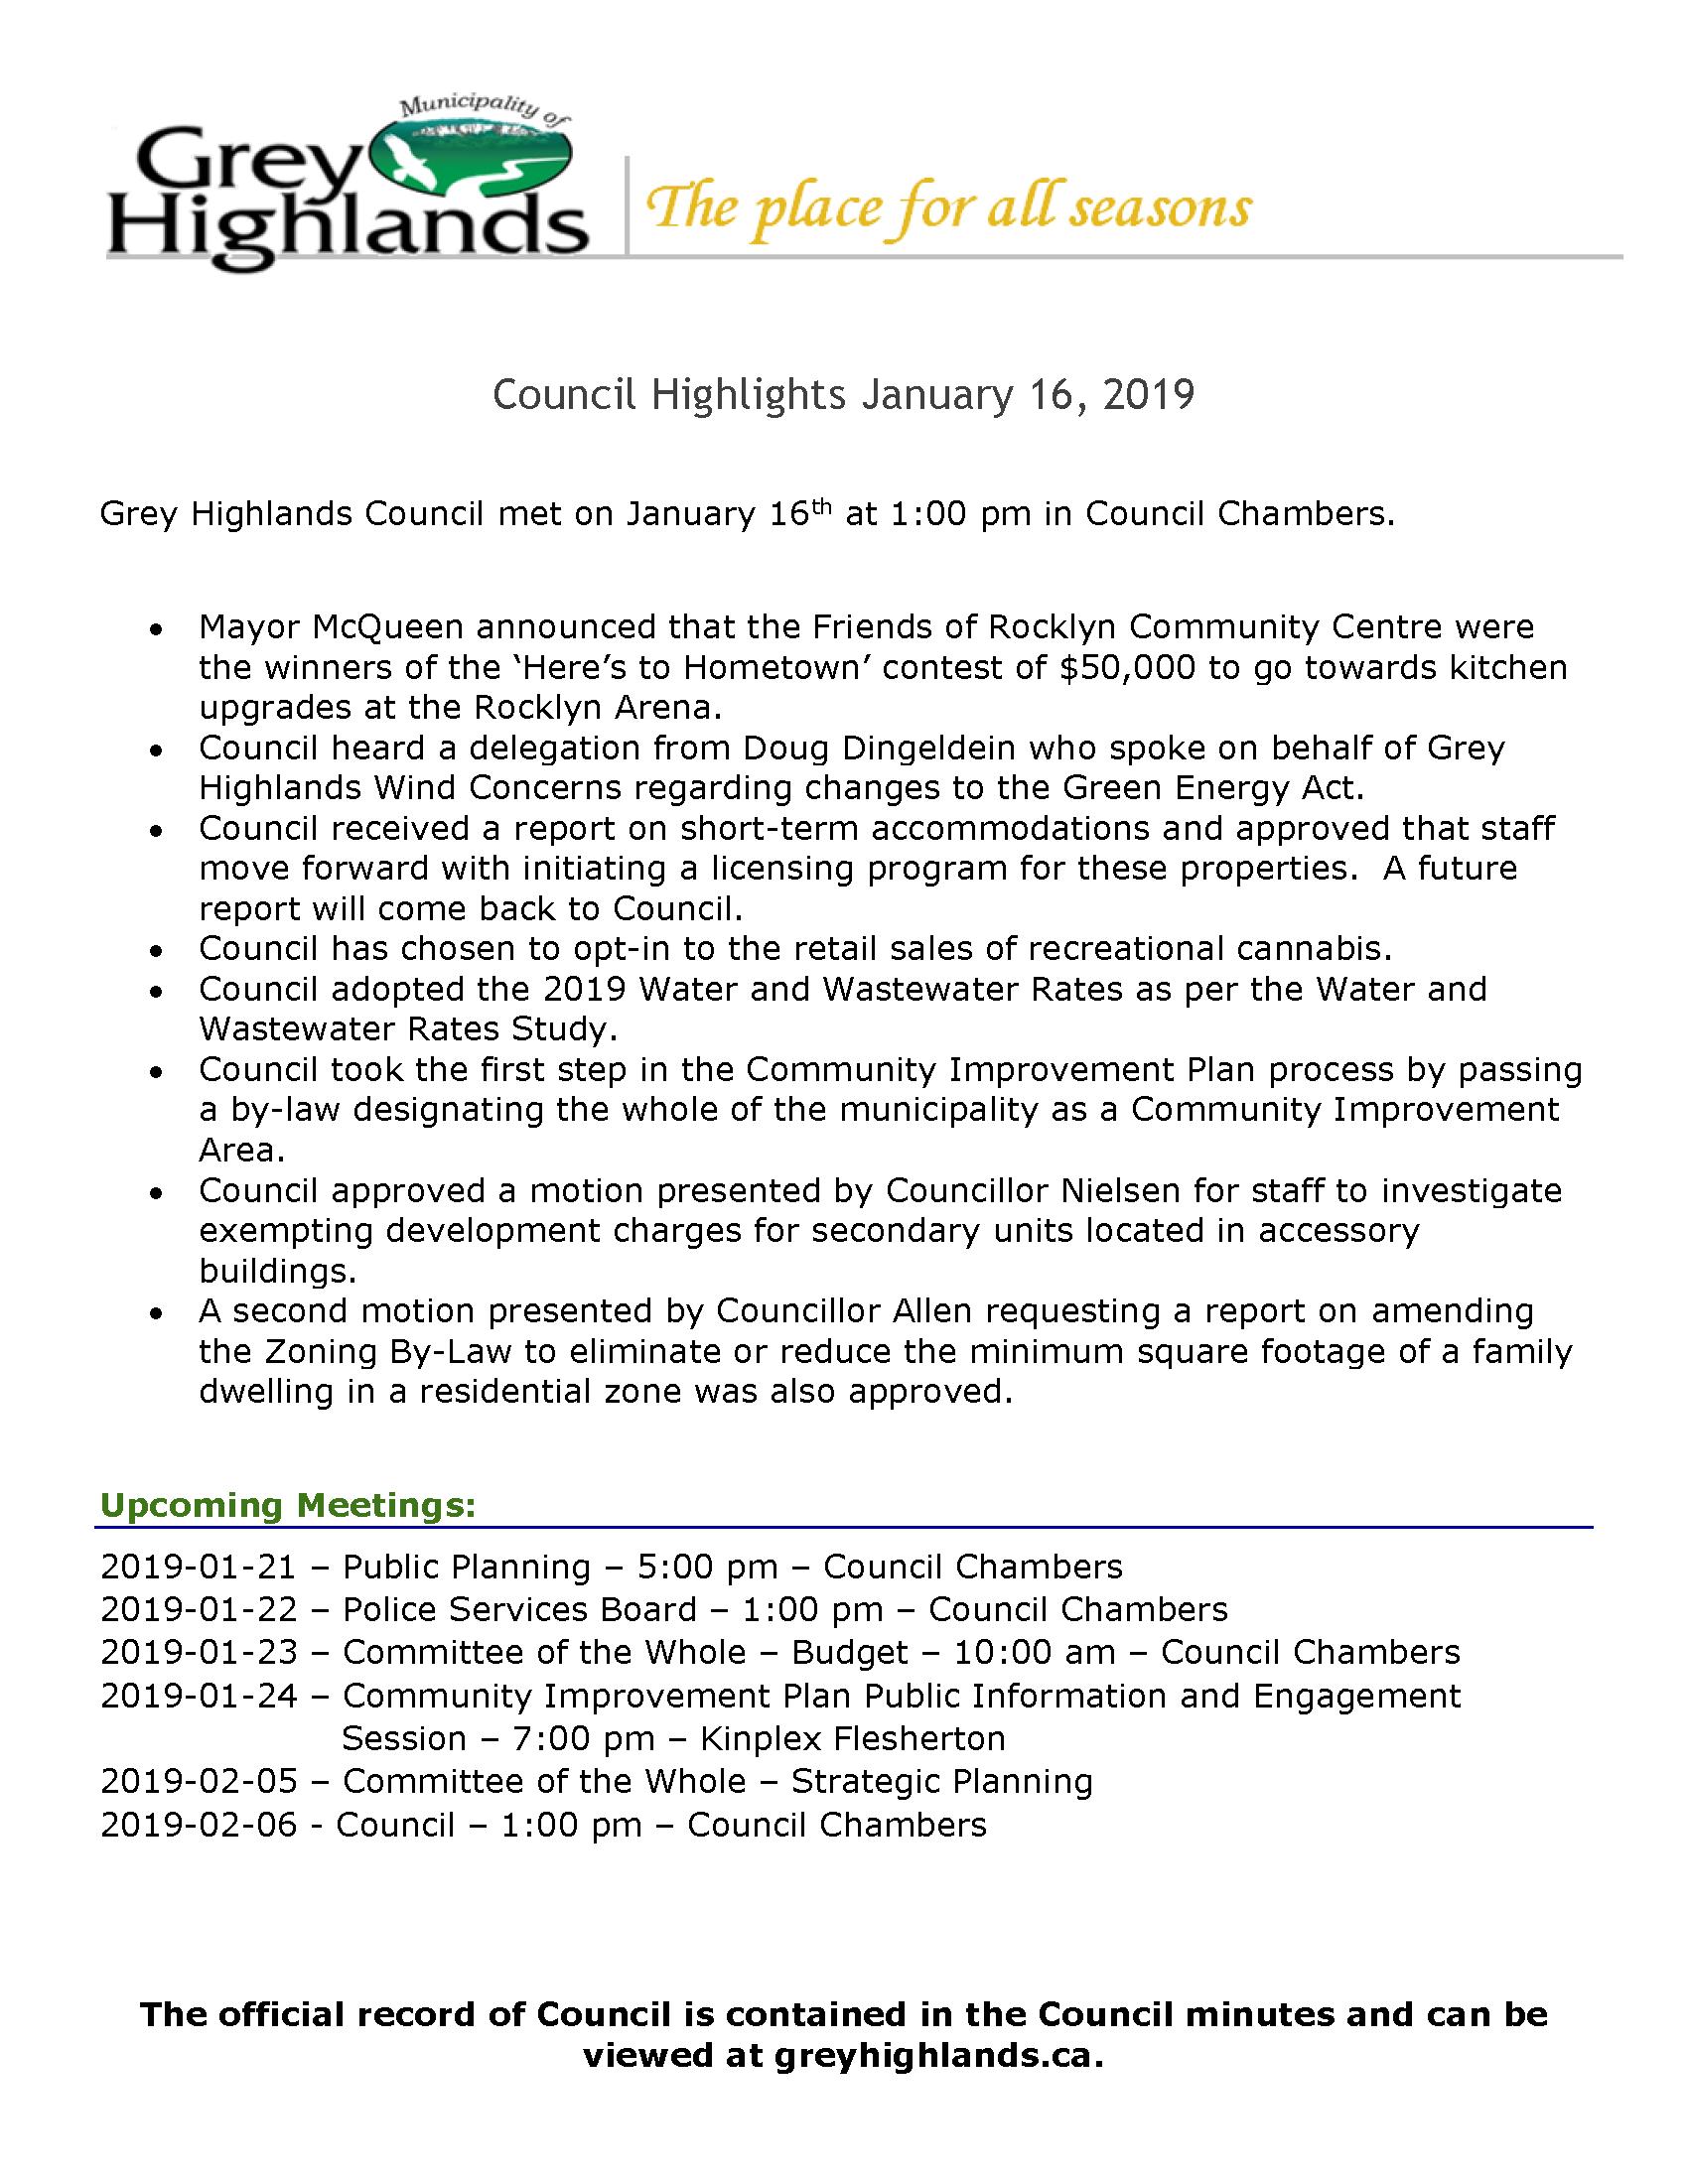 Council Highlights - January 16, 2019